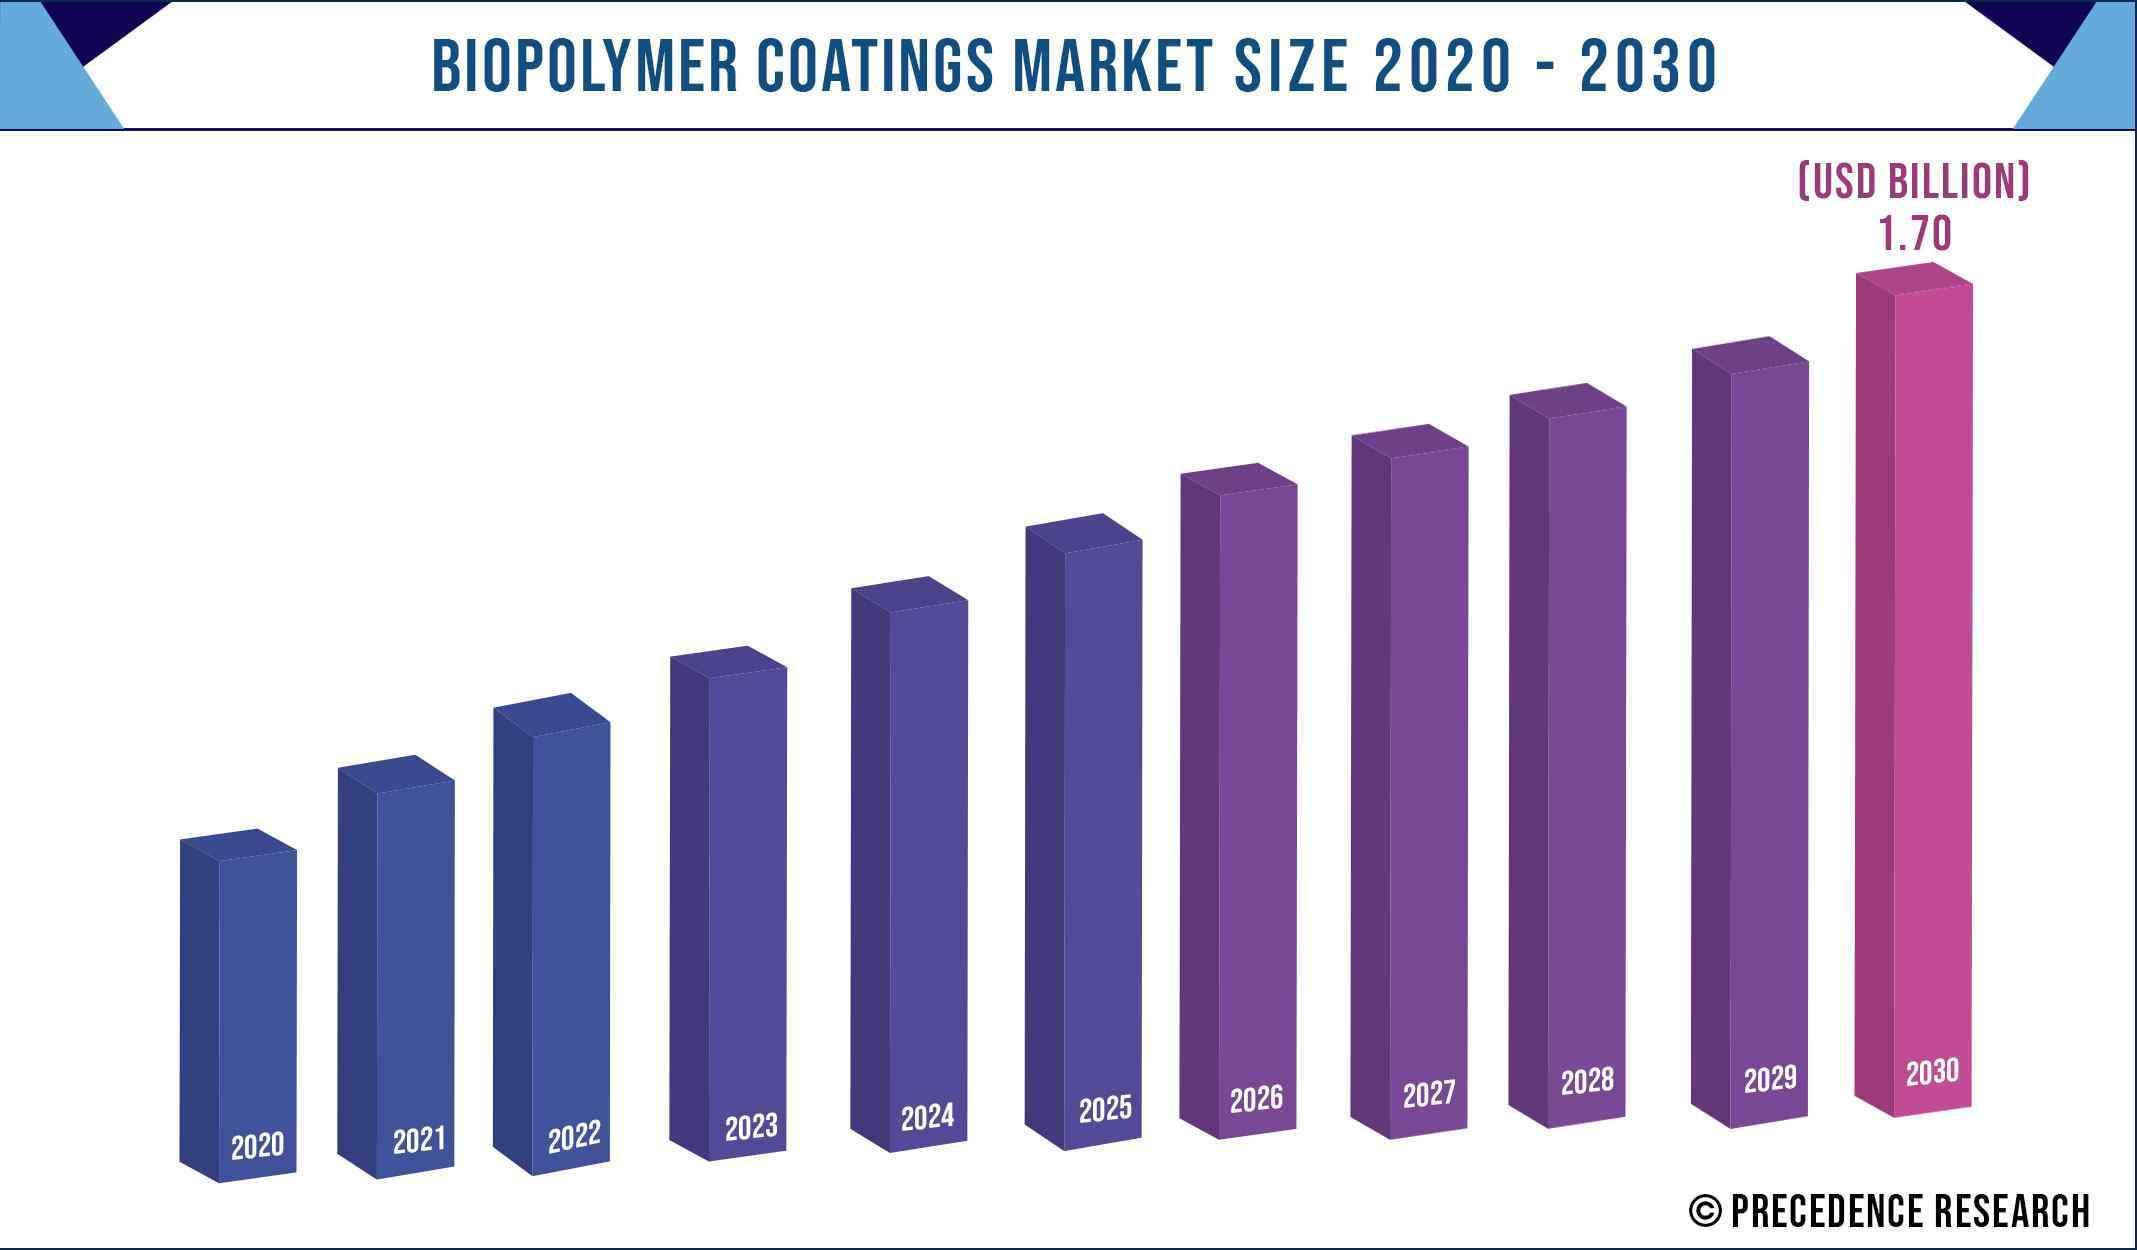 Biopolymer Coatings Market Size 2020-2030